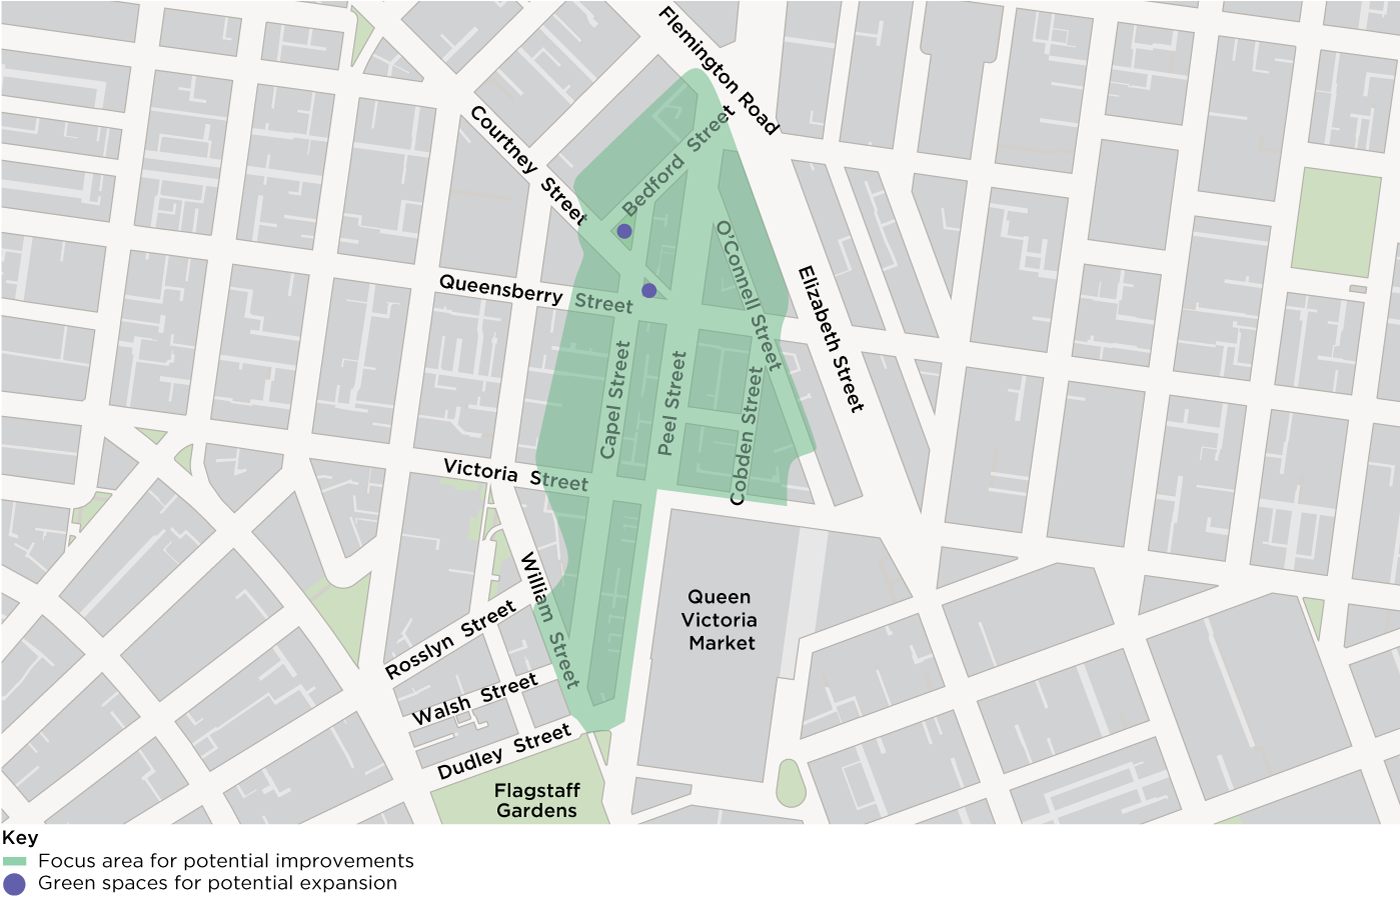 map of focus area